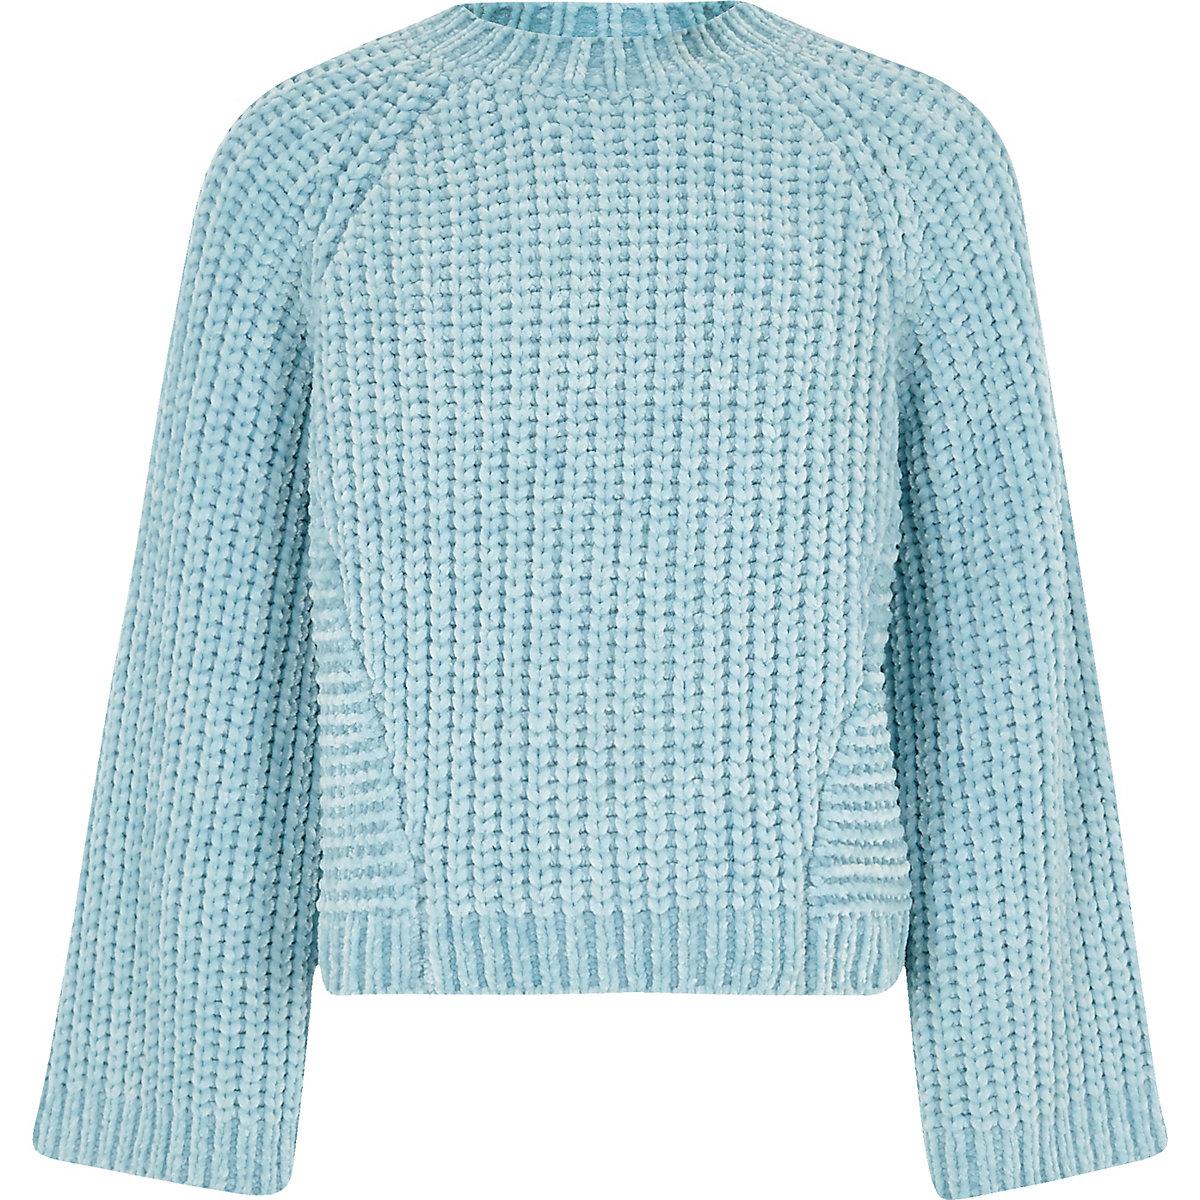 Girls blue chenille knit sweater